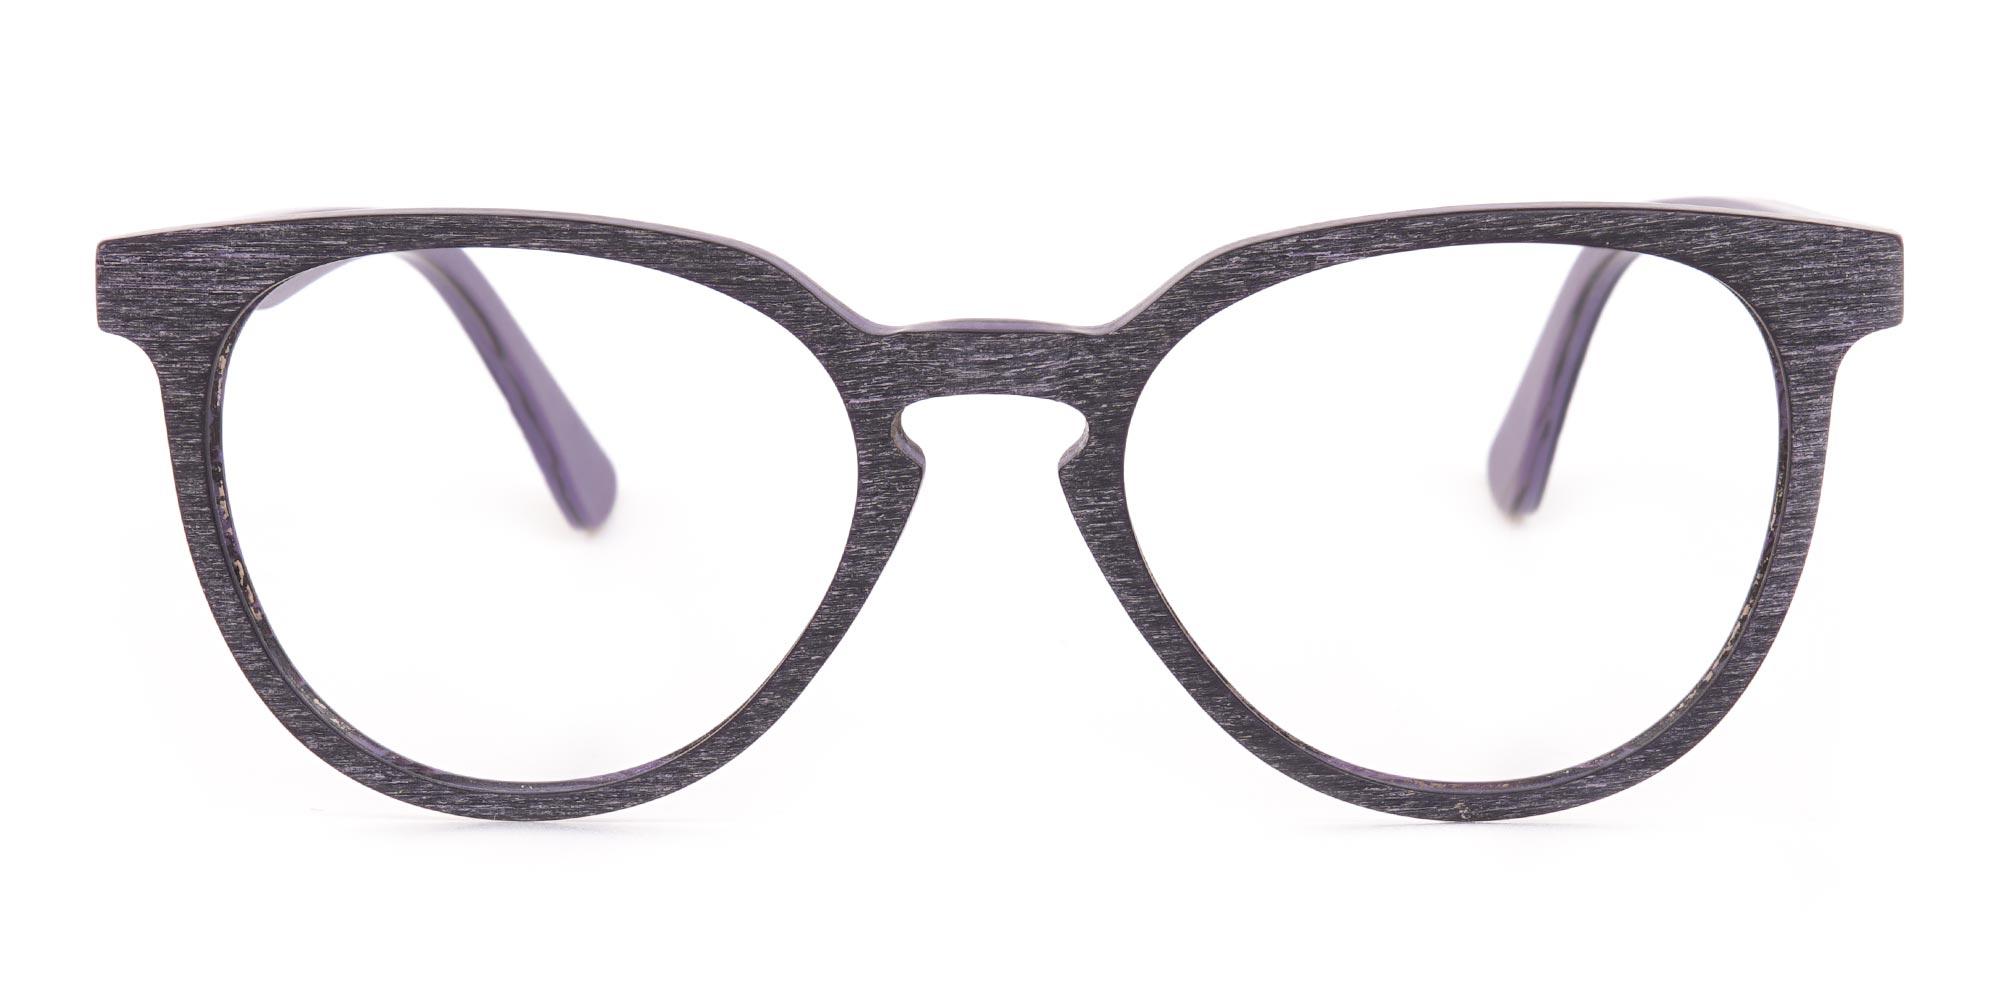 Wooden Glasses in Dark Purple